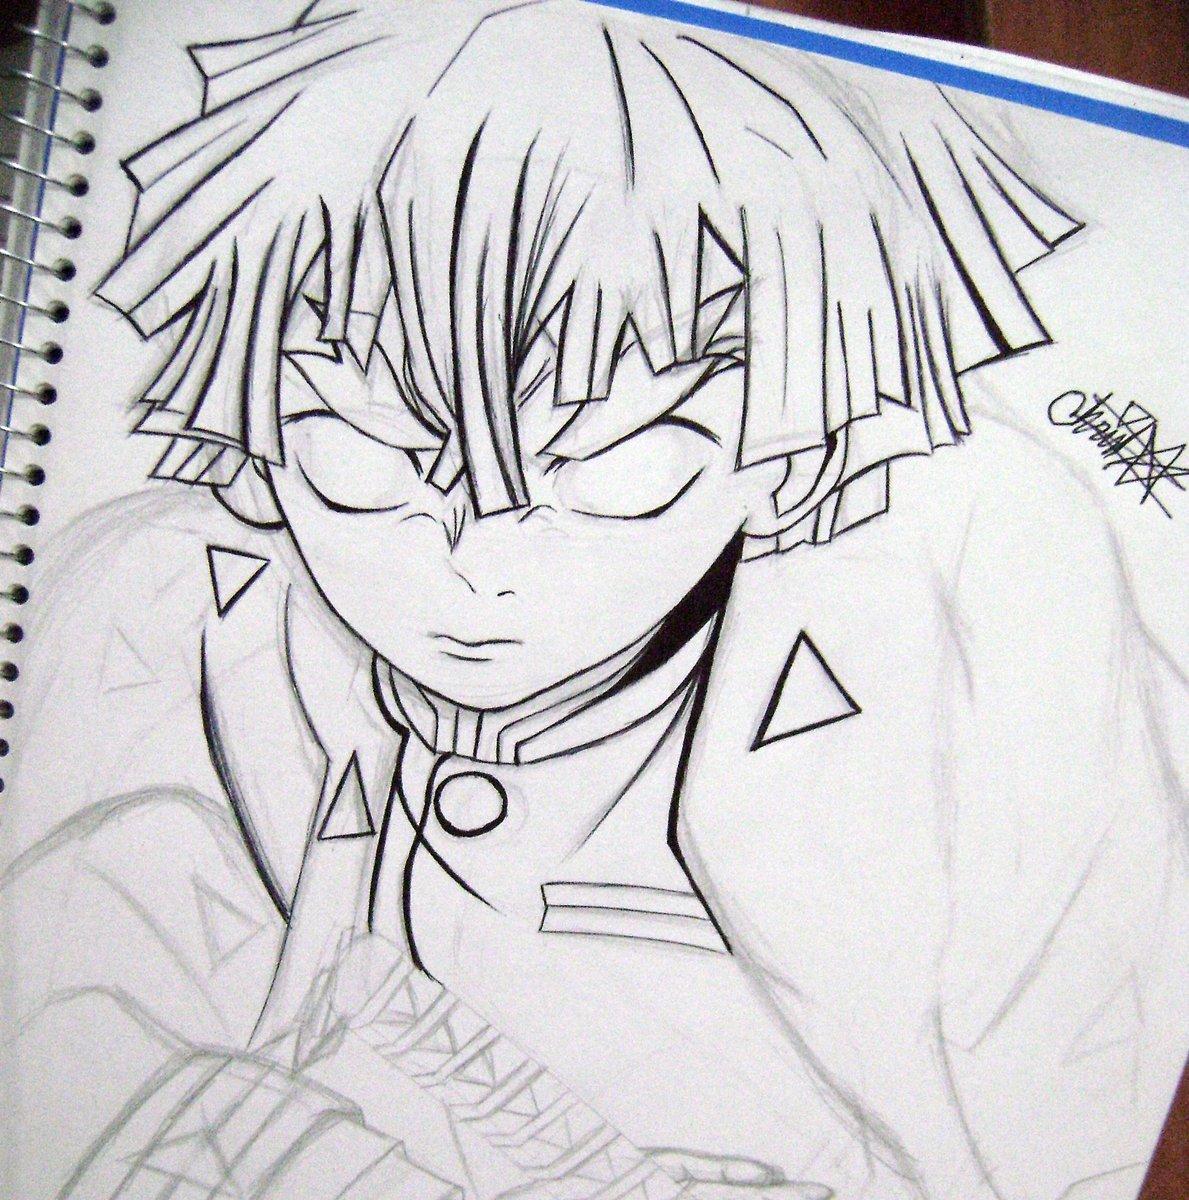 Zenitsu Agatsuma  Kimetsu no yaiba  sketch in process  ¿Black and white or color? Need help.  IG:  ( Here ) https://www.instagram.com/hoolasoychris/  #kimetsunoyaiba #drawing #mangadrawing #tanjiroukamado #zenitsu #dibujos #scketch #fanart #mangaedit #mangaart #animebreathpic.twitter.com/4T2clZvipW